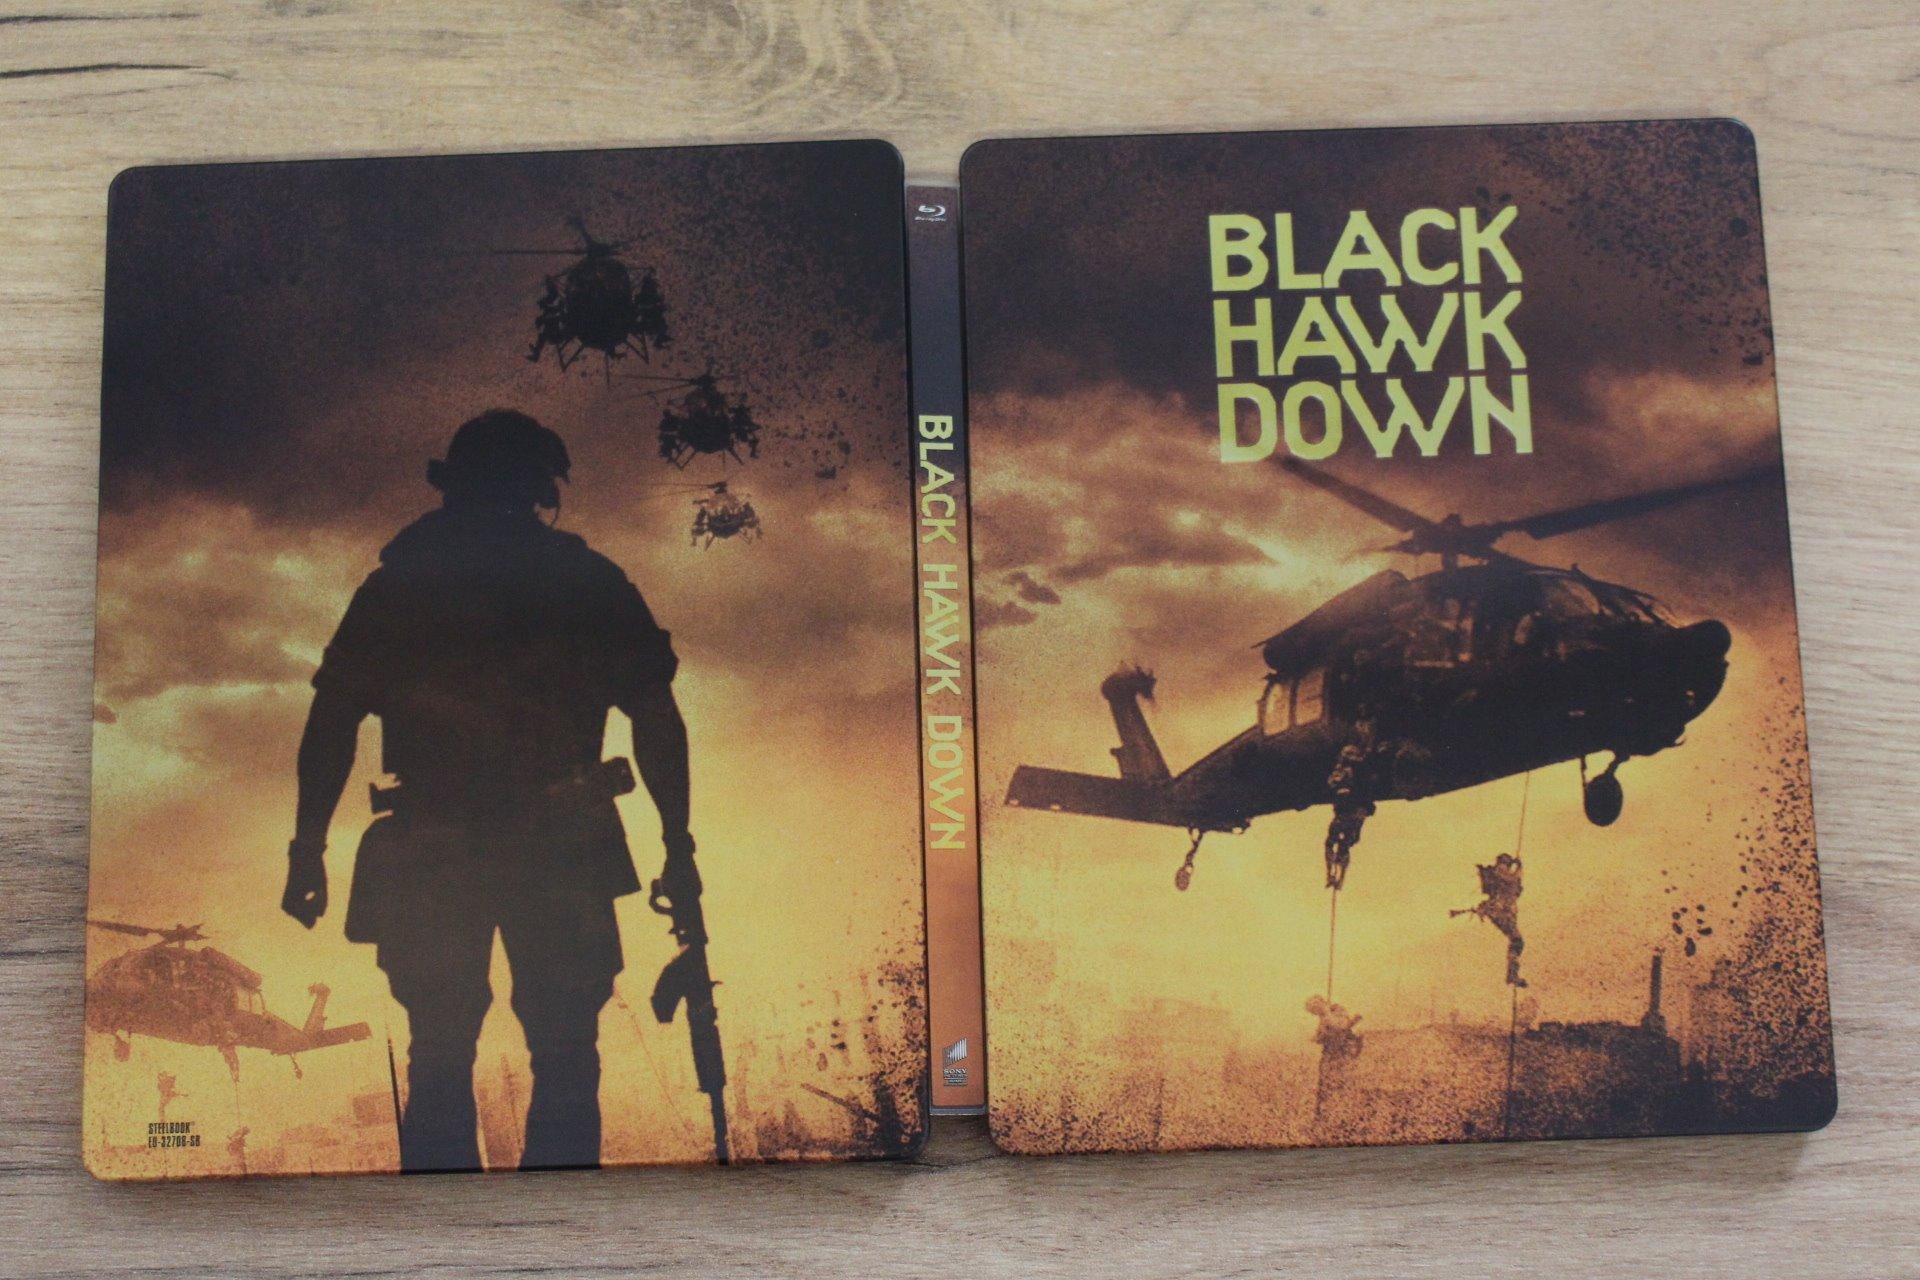 Black-Hawk-Down-steelbook-filmarena4